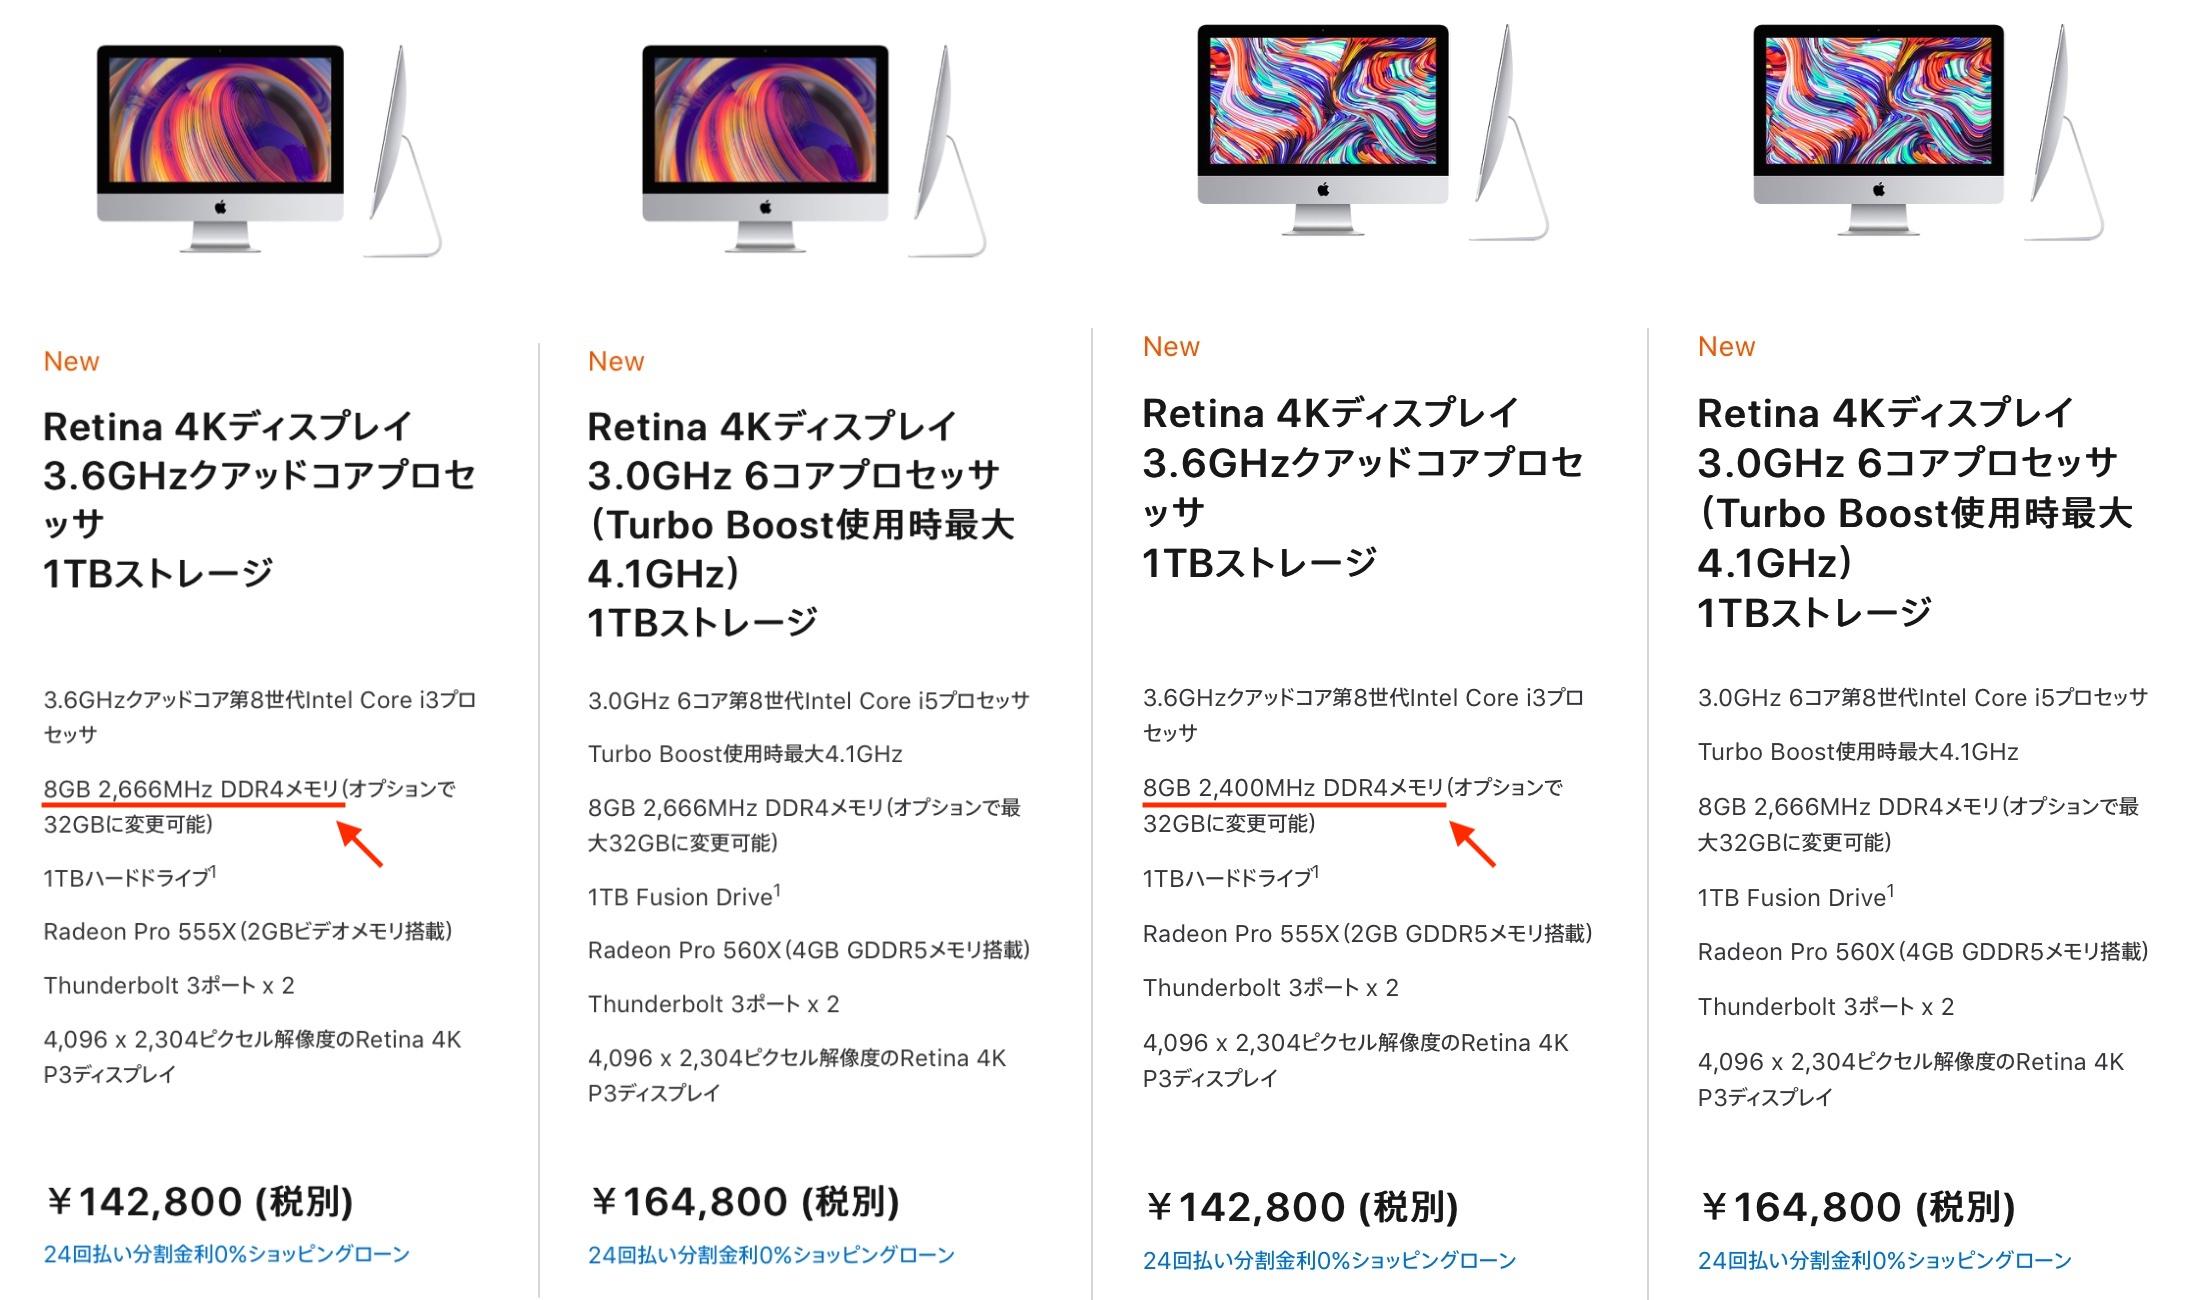 iMac (Retina 4K, 21.5インチ, 2019) 仕様